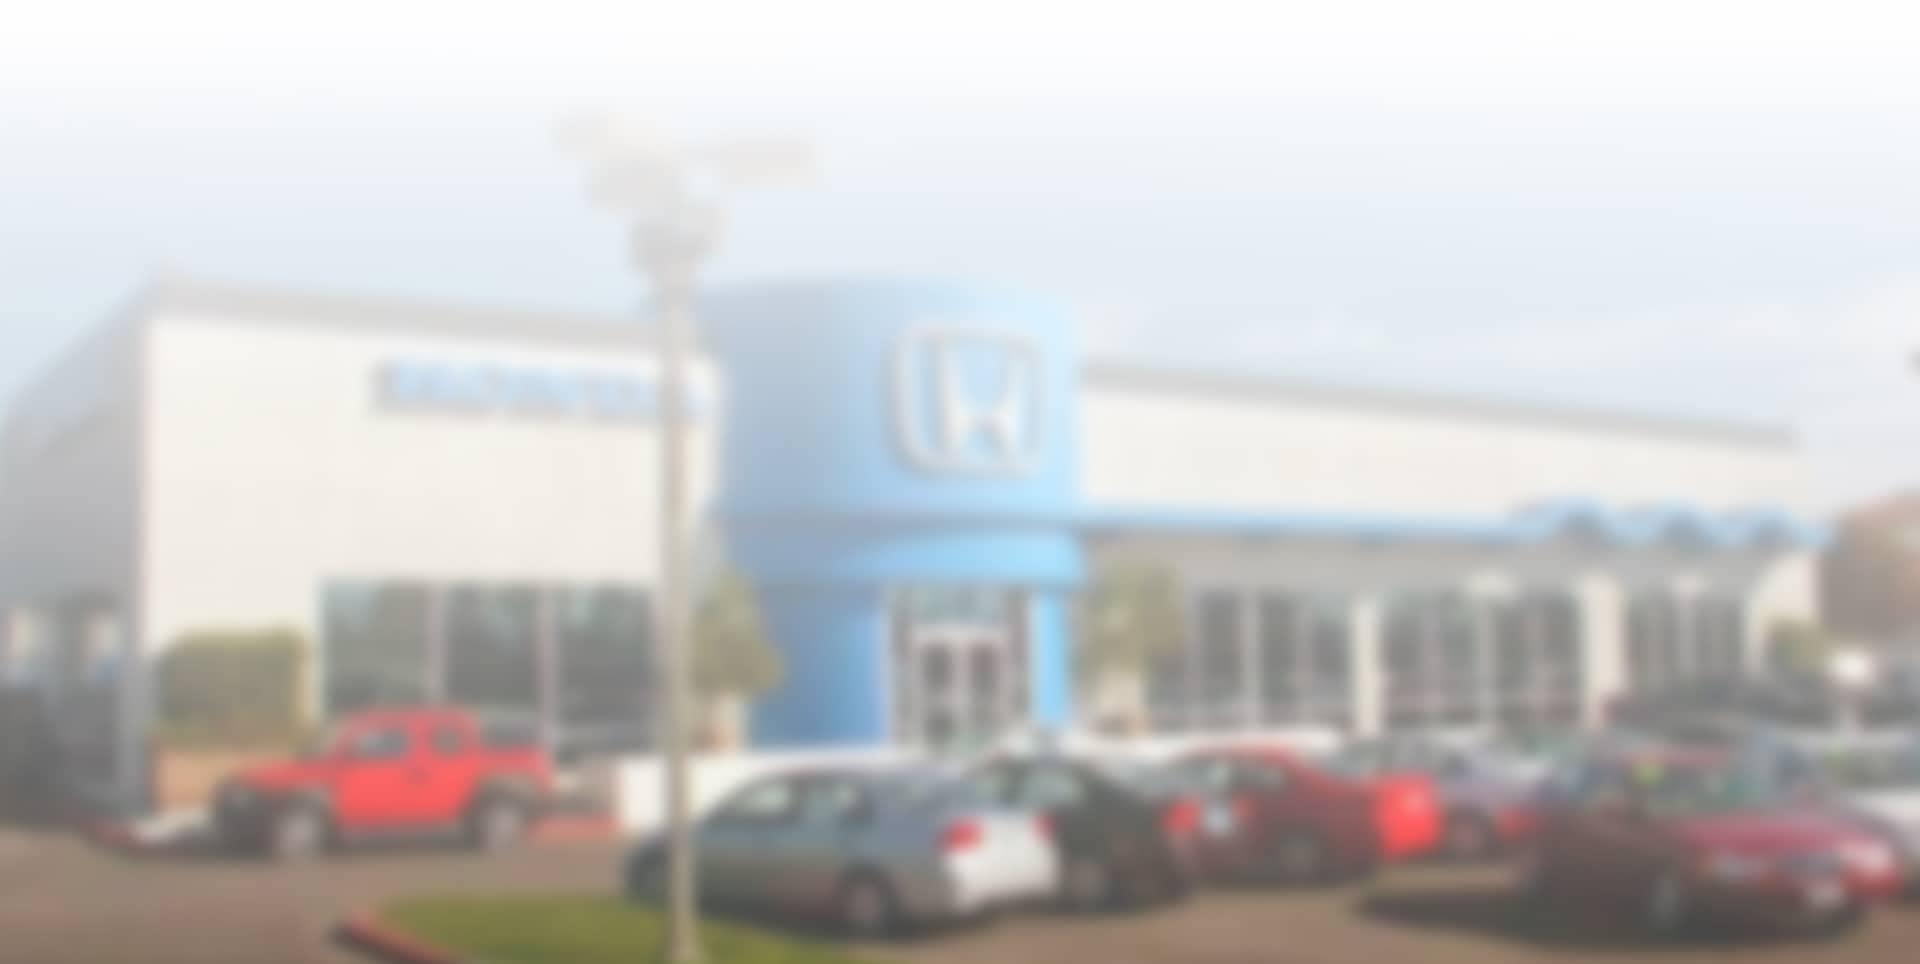 Capitol Honda dealership image